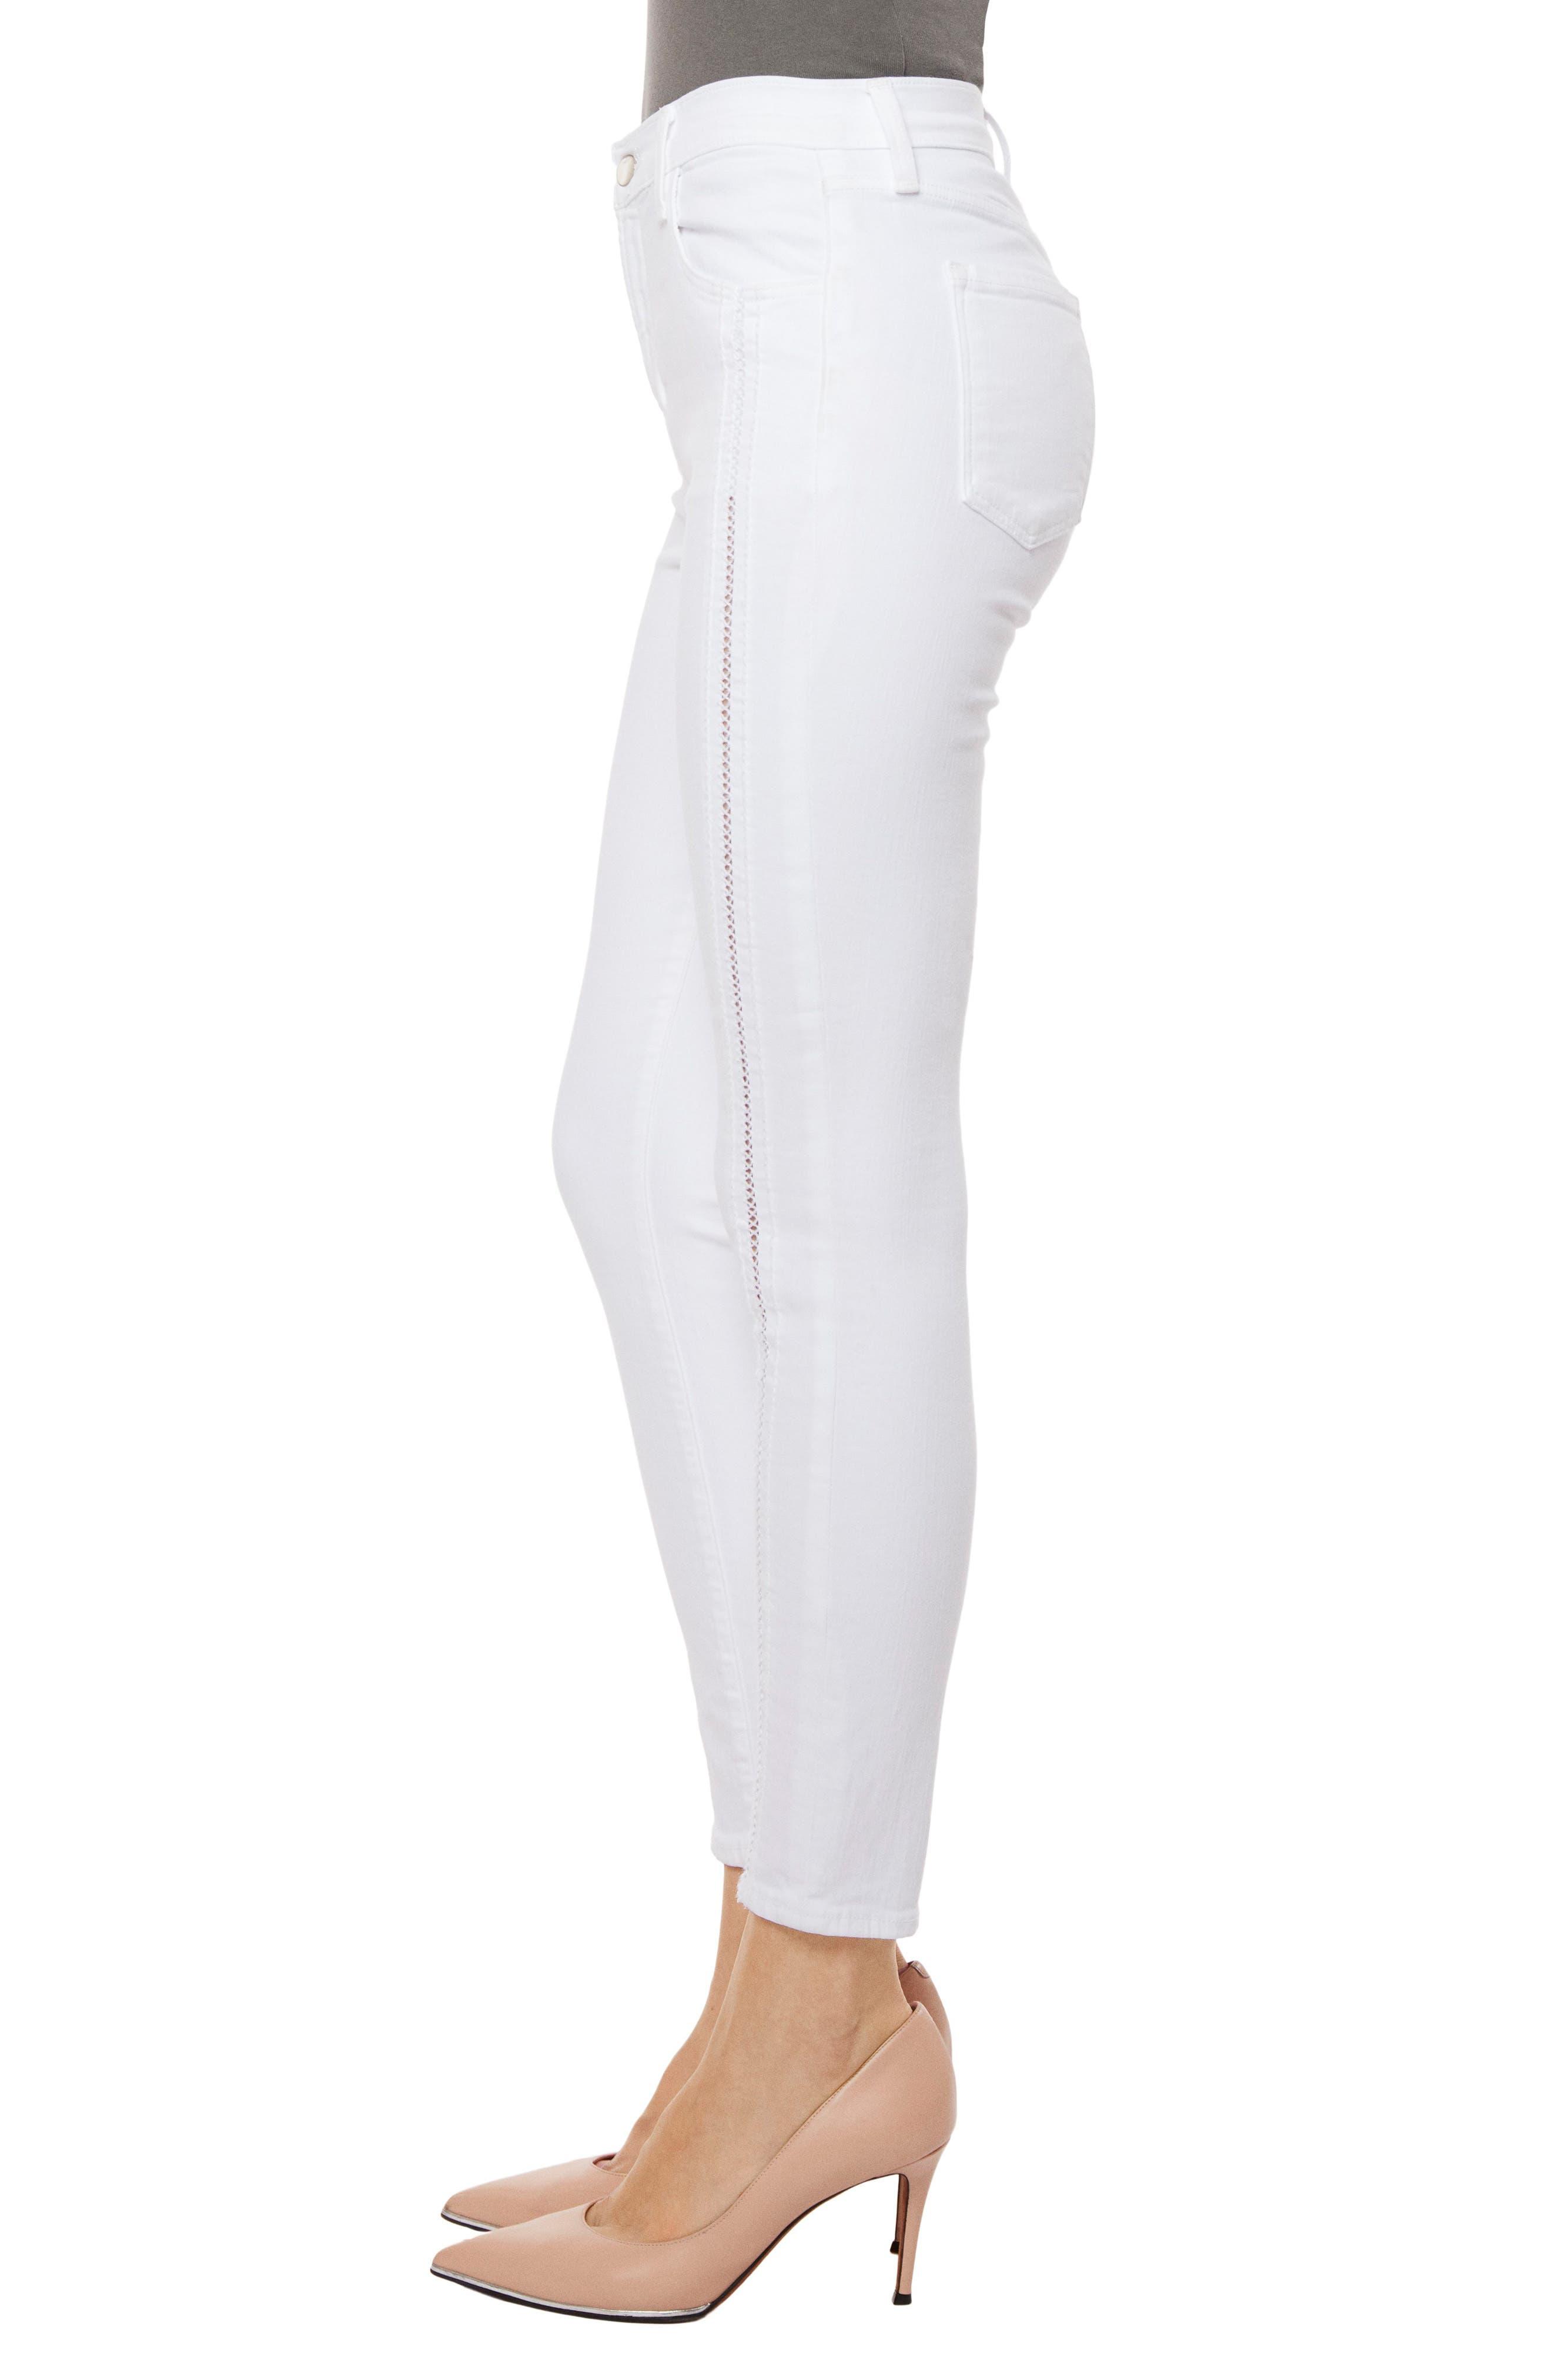 Alana High Waist Crop Skinny Jeans,                             Alternate thumbnail 3, color,                             160